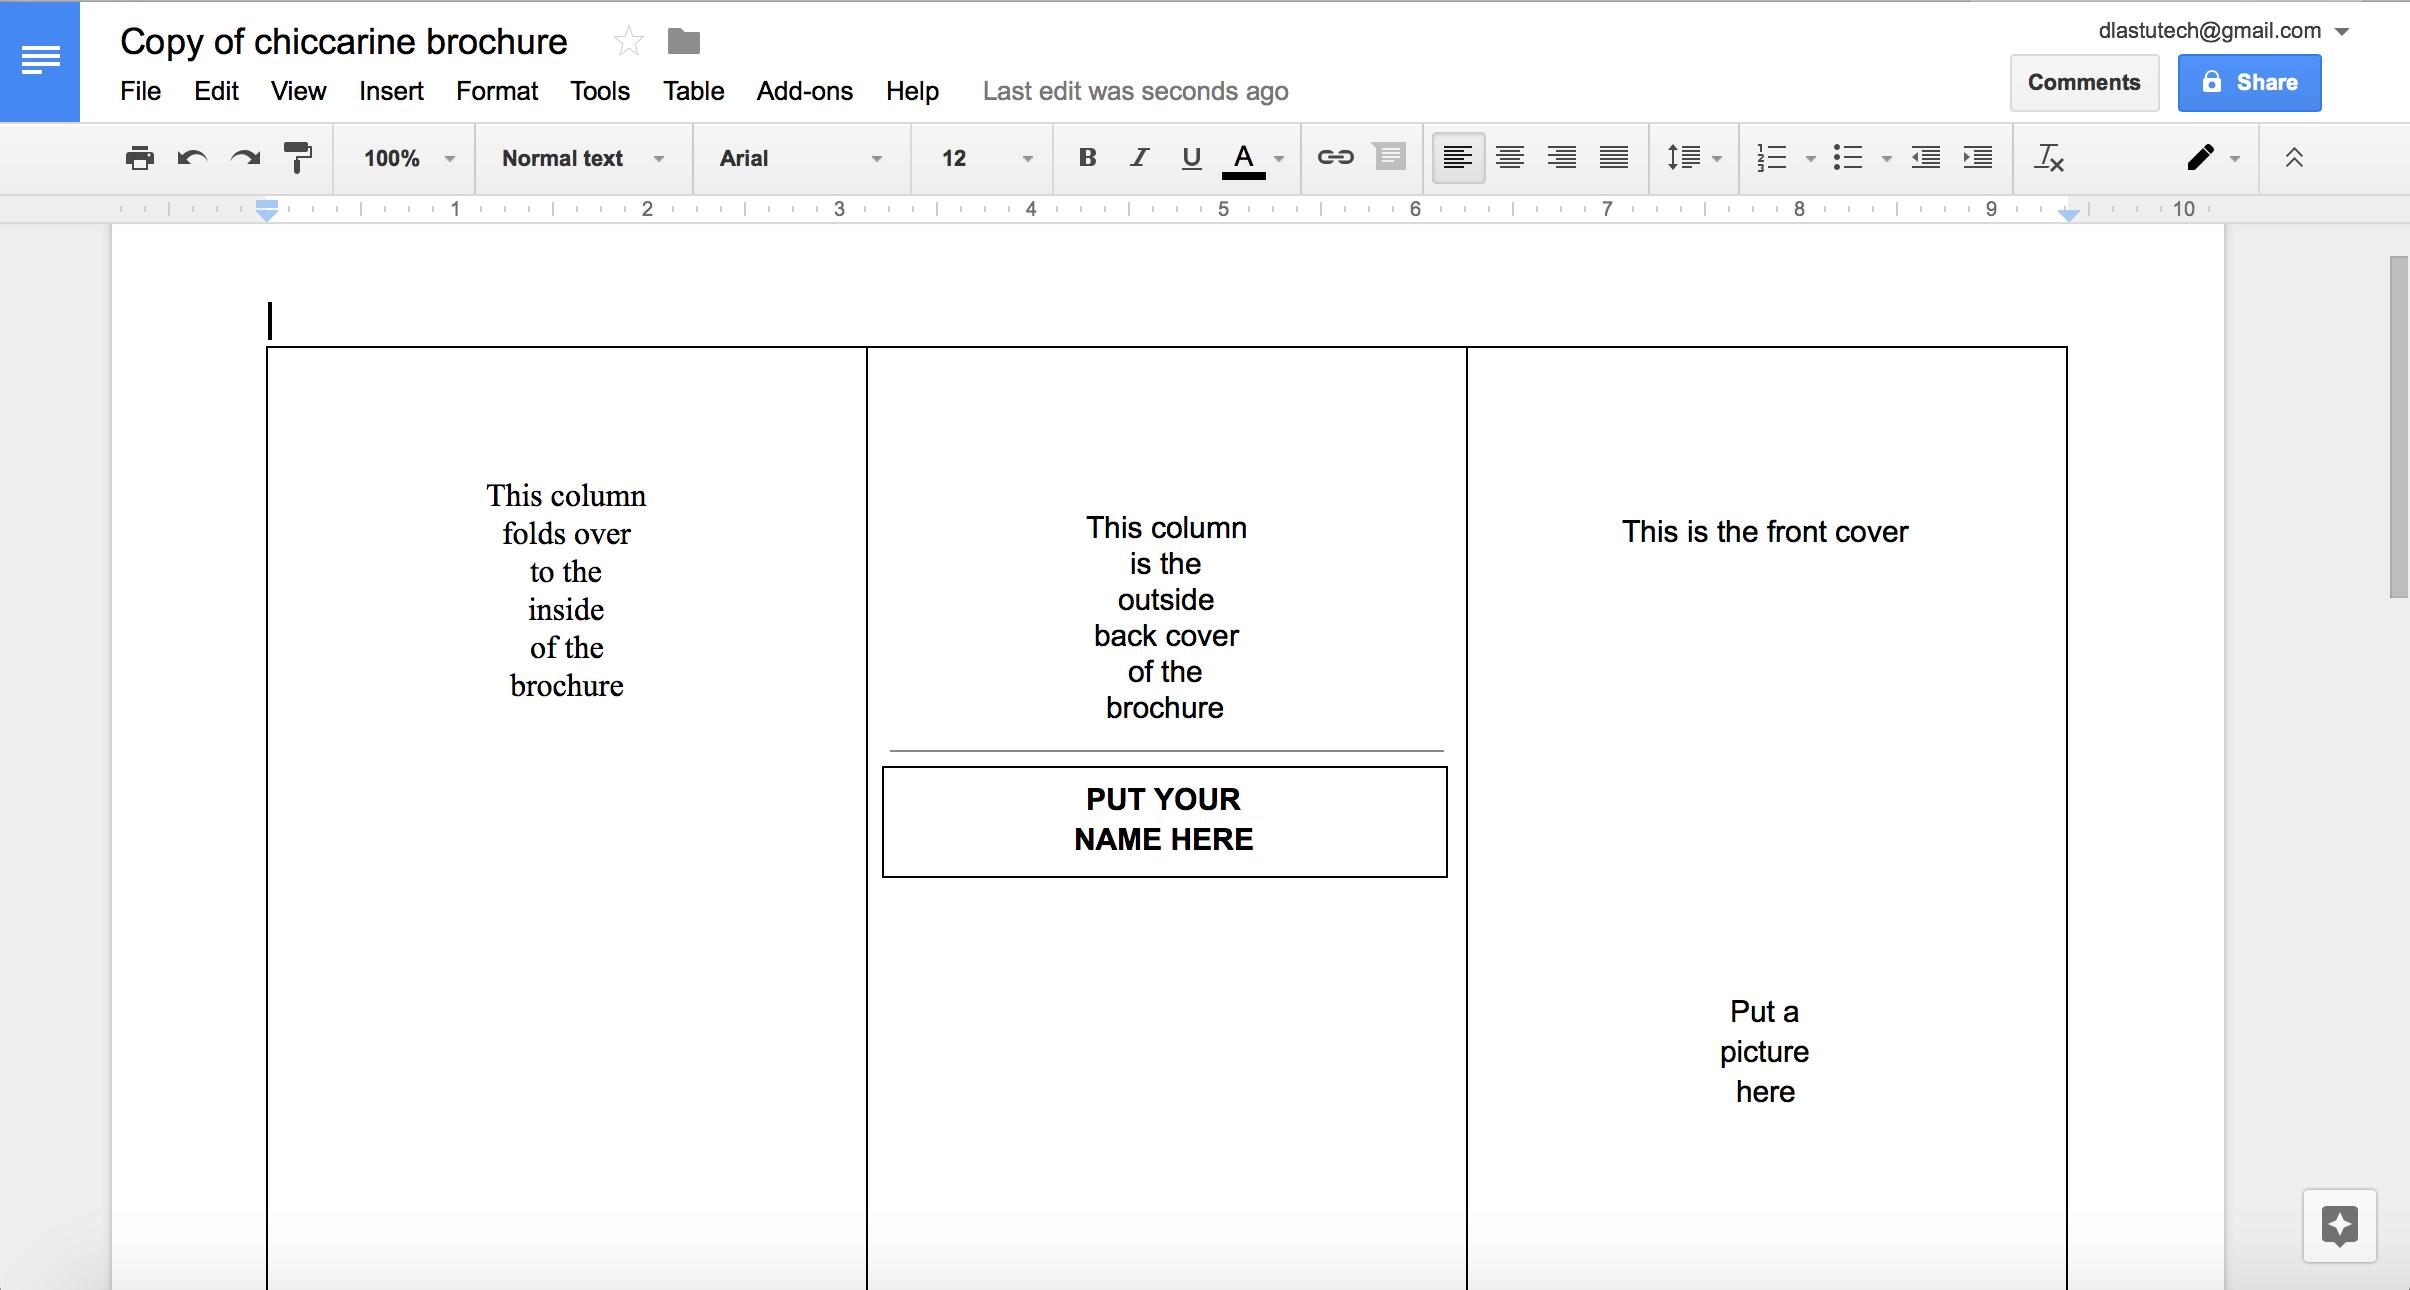 Tutorial: Making A Brochure Using Google Docs From A Regarding Google Drive Brochure Template